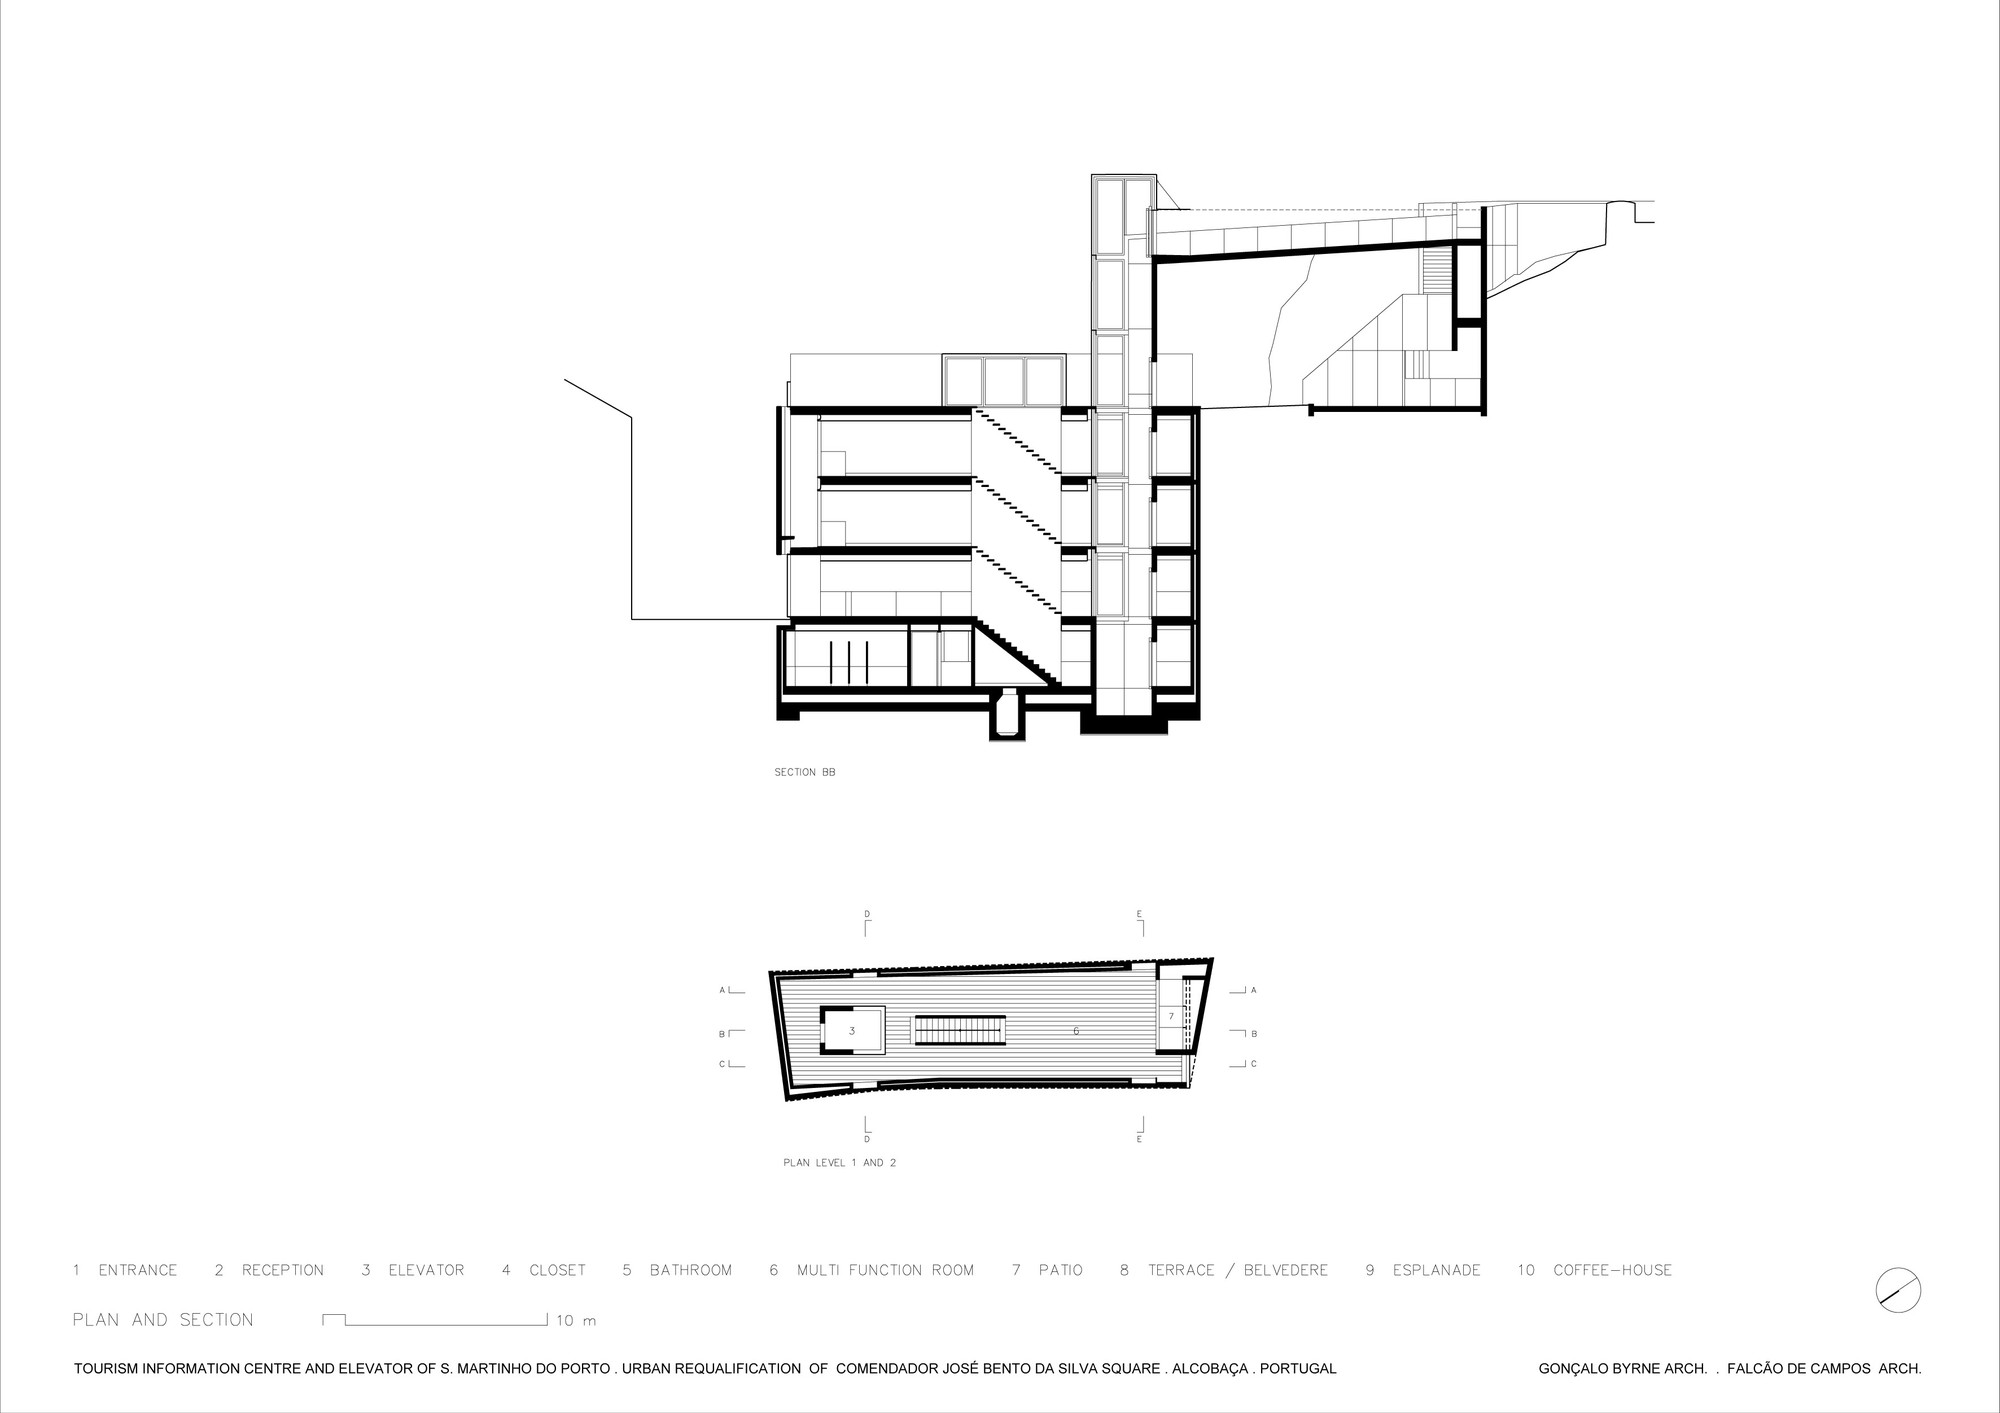 Gallery Of Urban Requalification Of S Martinho Do Porto Goncalo Byrne Arquitectos 20